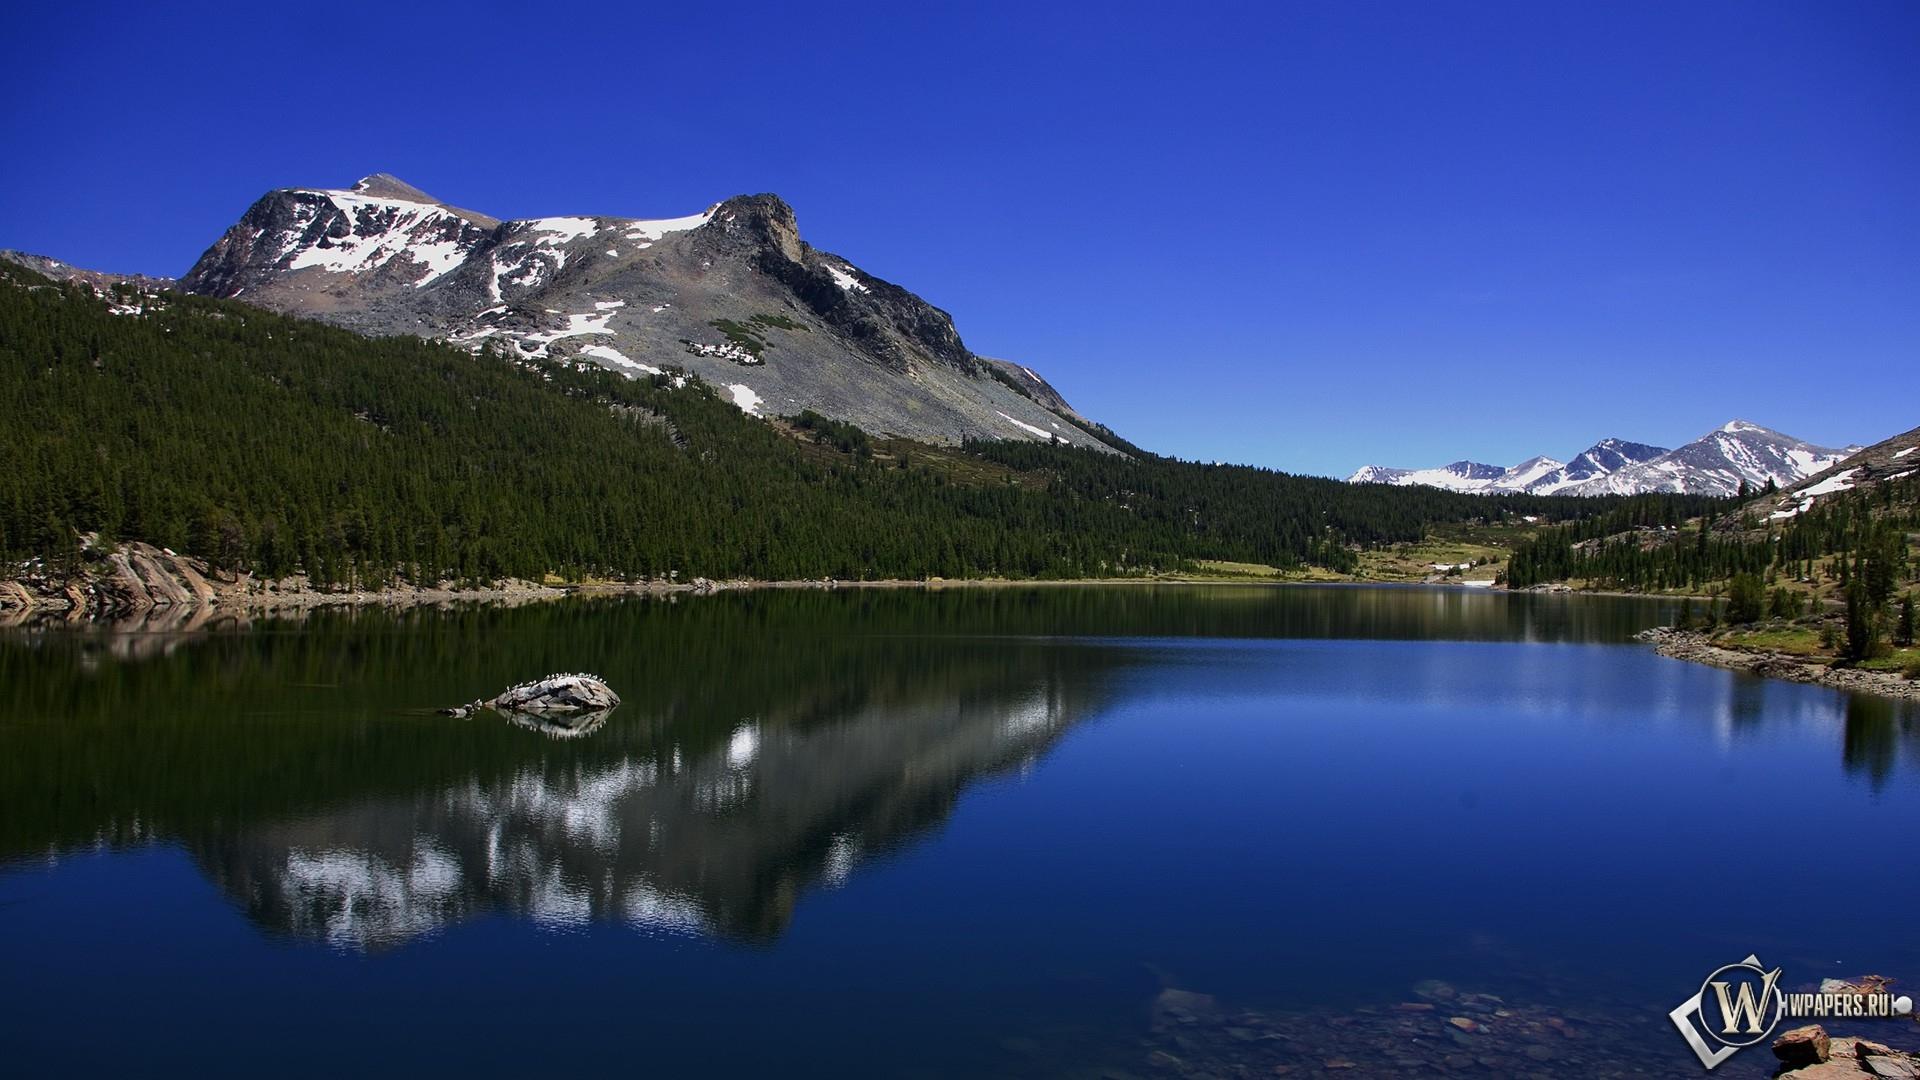 Горное озеро 1920x1080